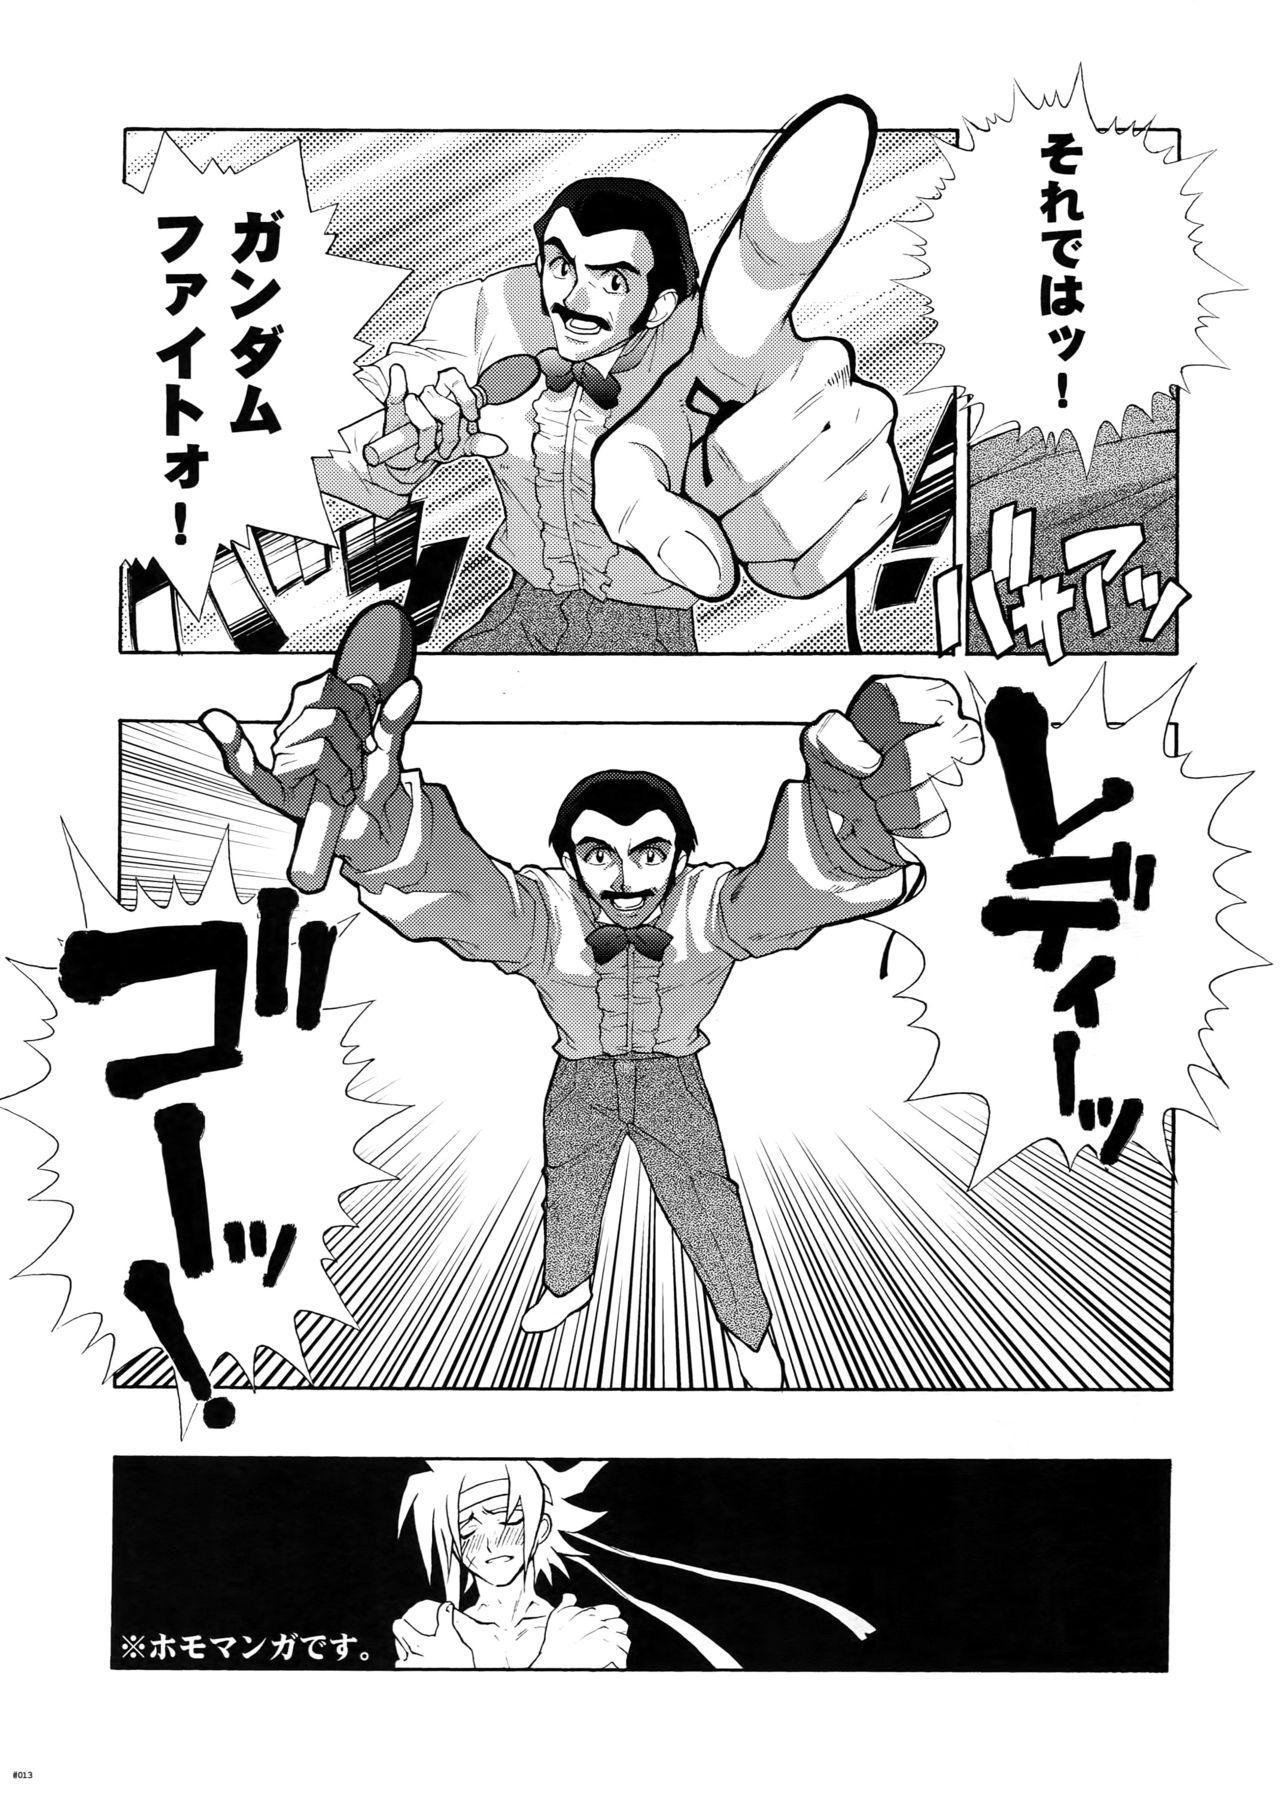 [Article 60 of Criminal Code (Shuhan)] G-gan Josei-Muke Sairoku-Shuu (G Gundam) 12